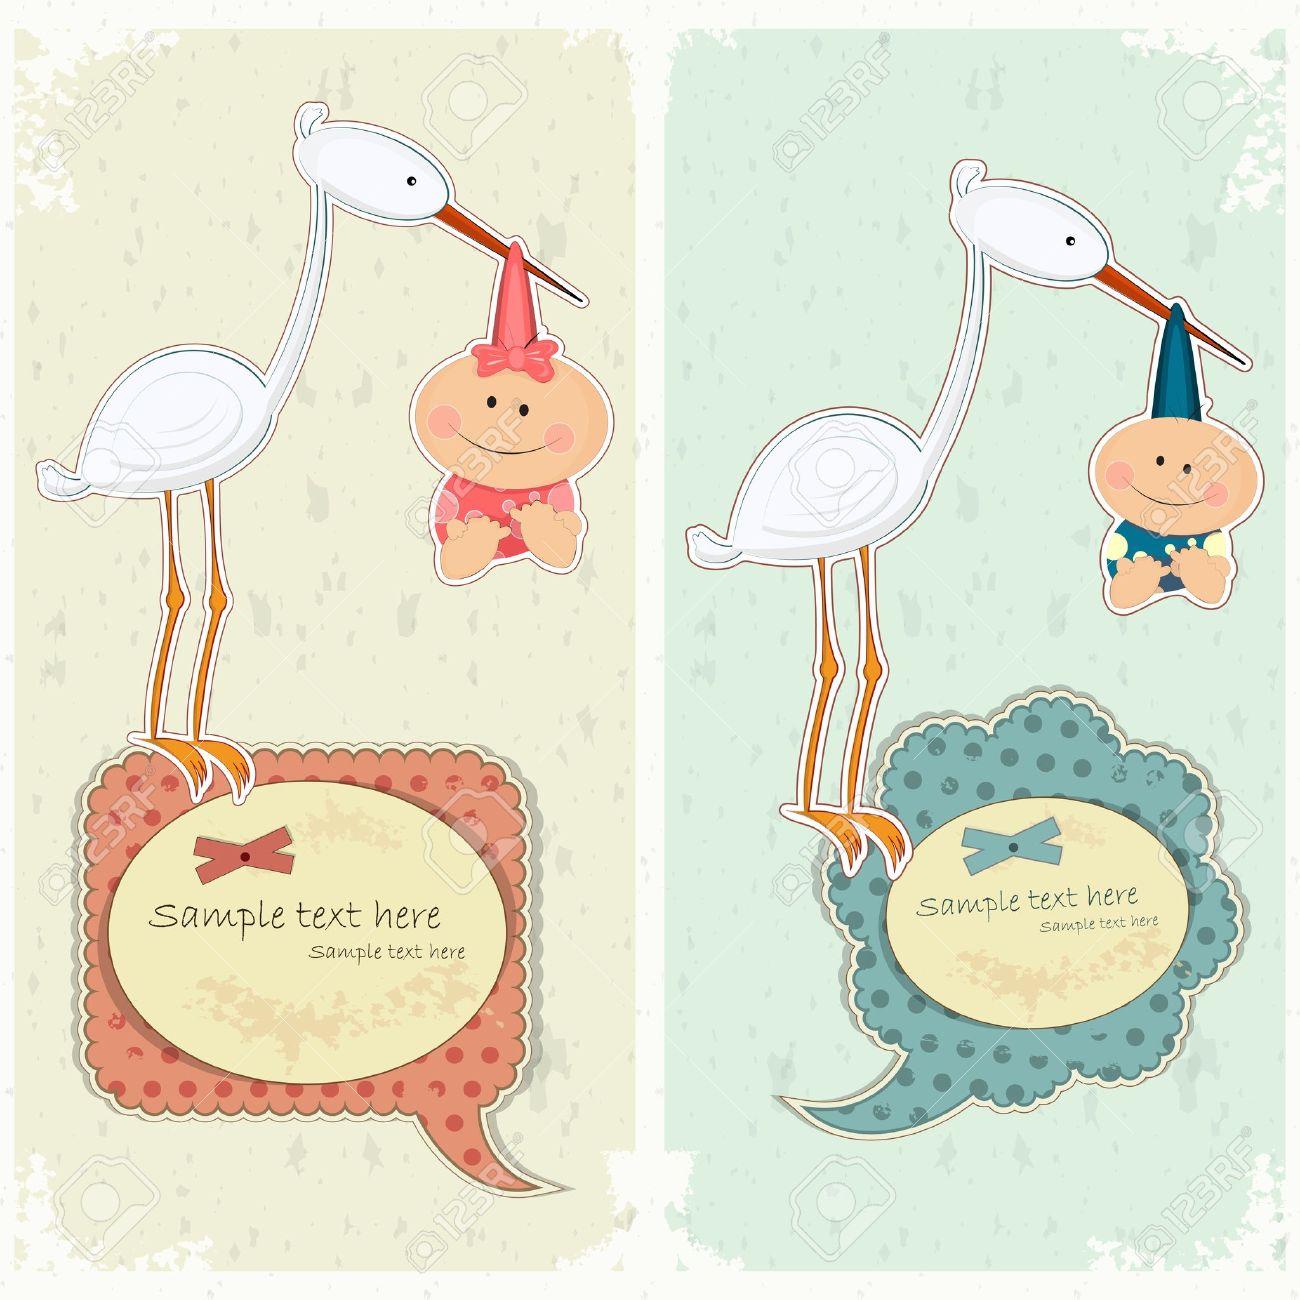 Baby postcard in vintage style - stork holding newborn - vector illustration Stock Vector - 12324679